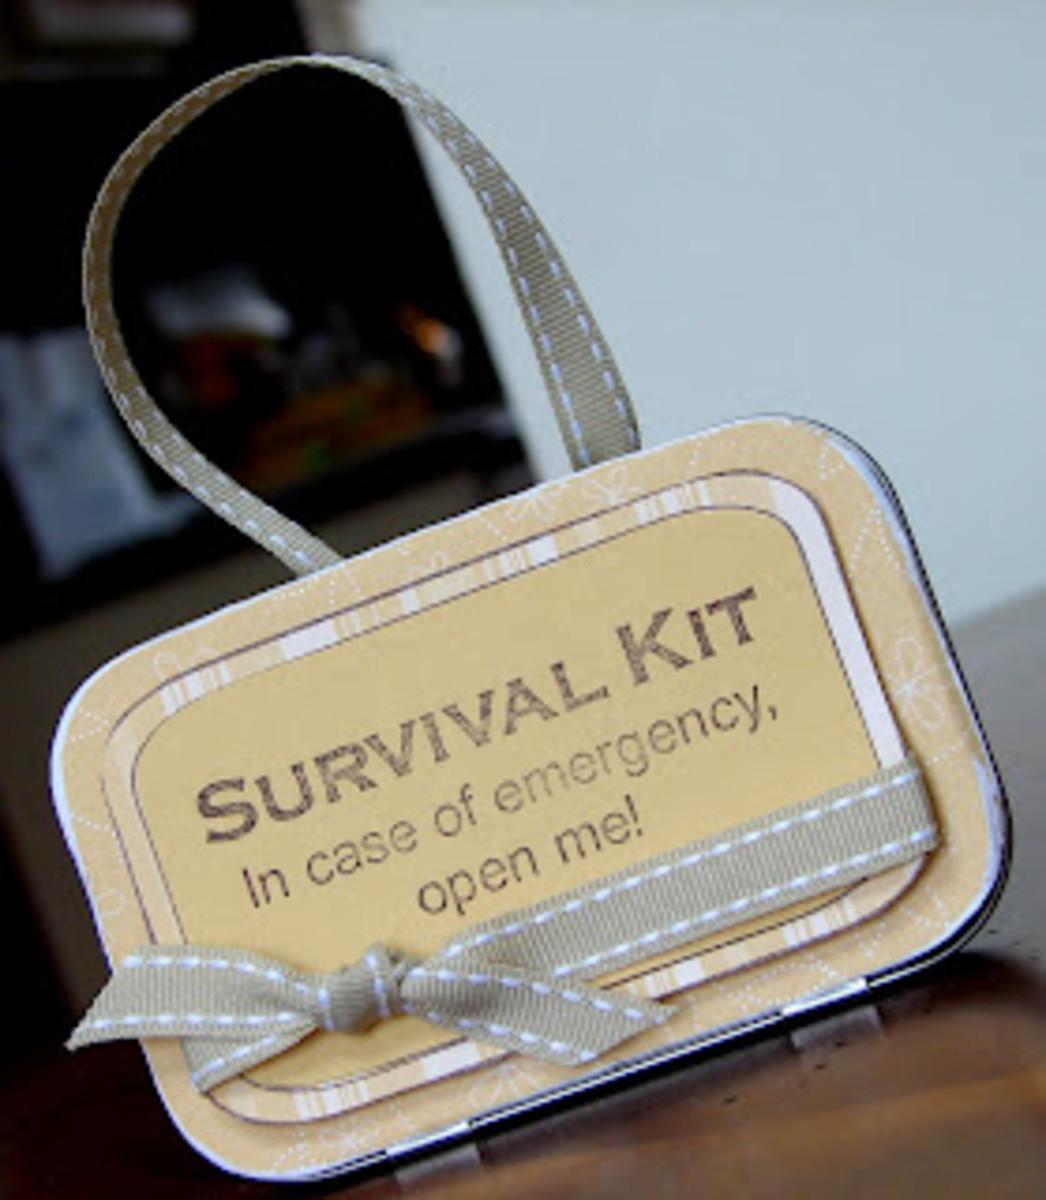 germaphobe Survival Kit